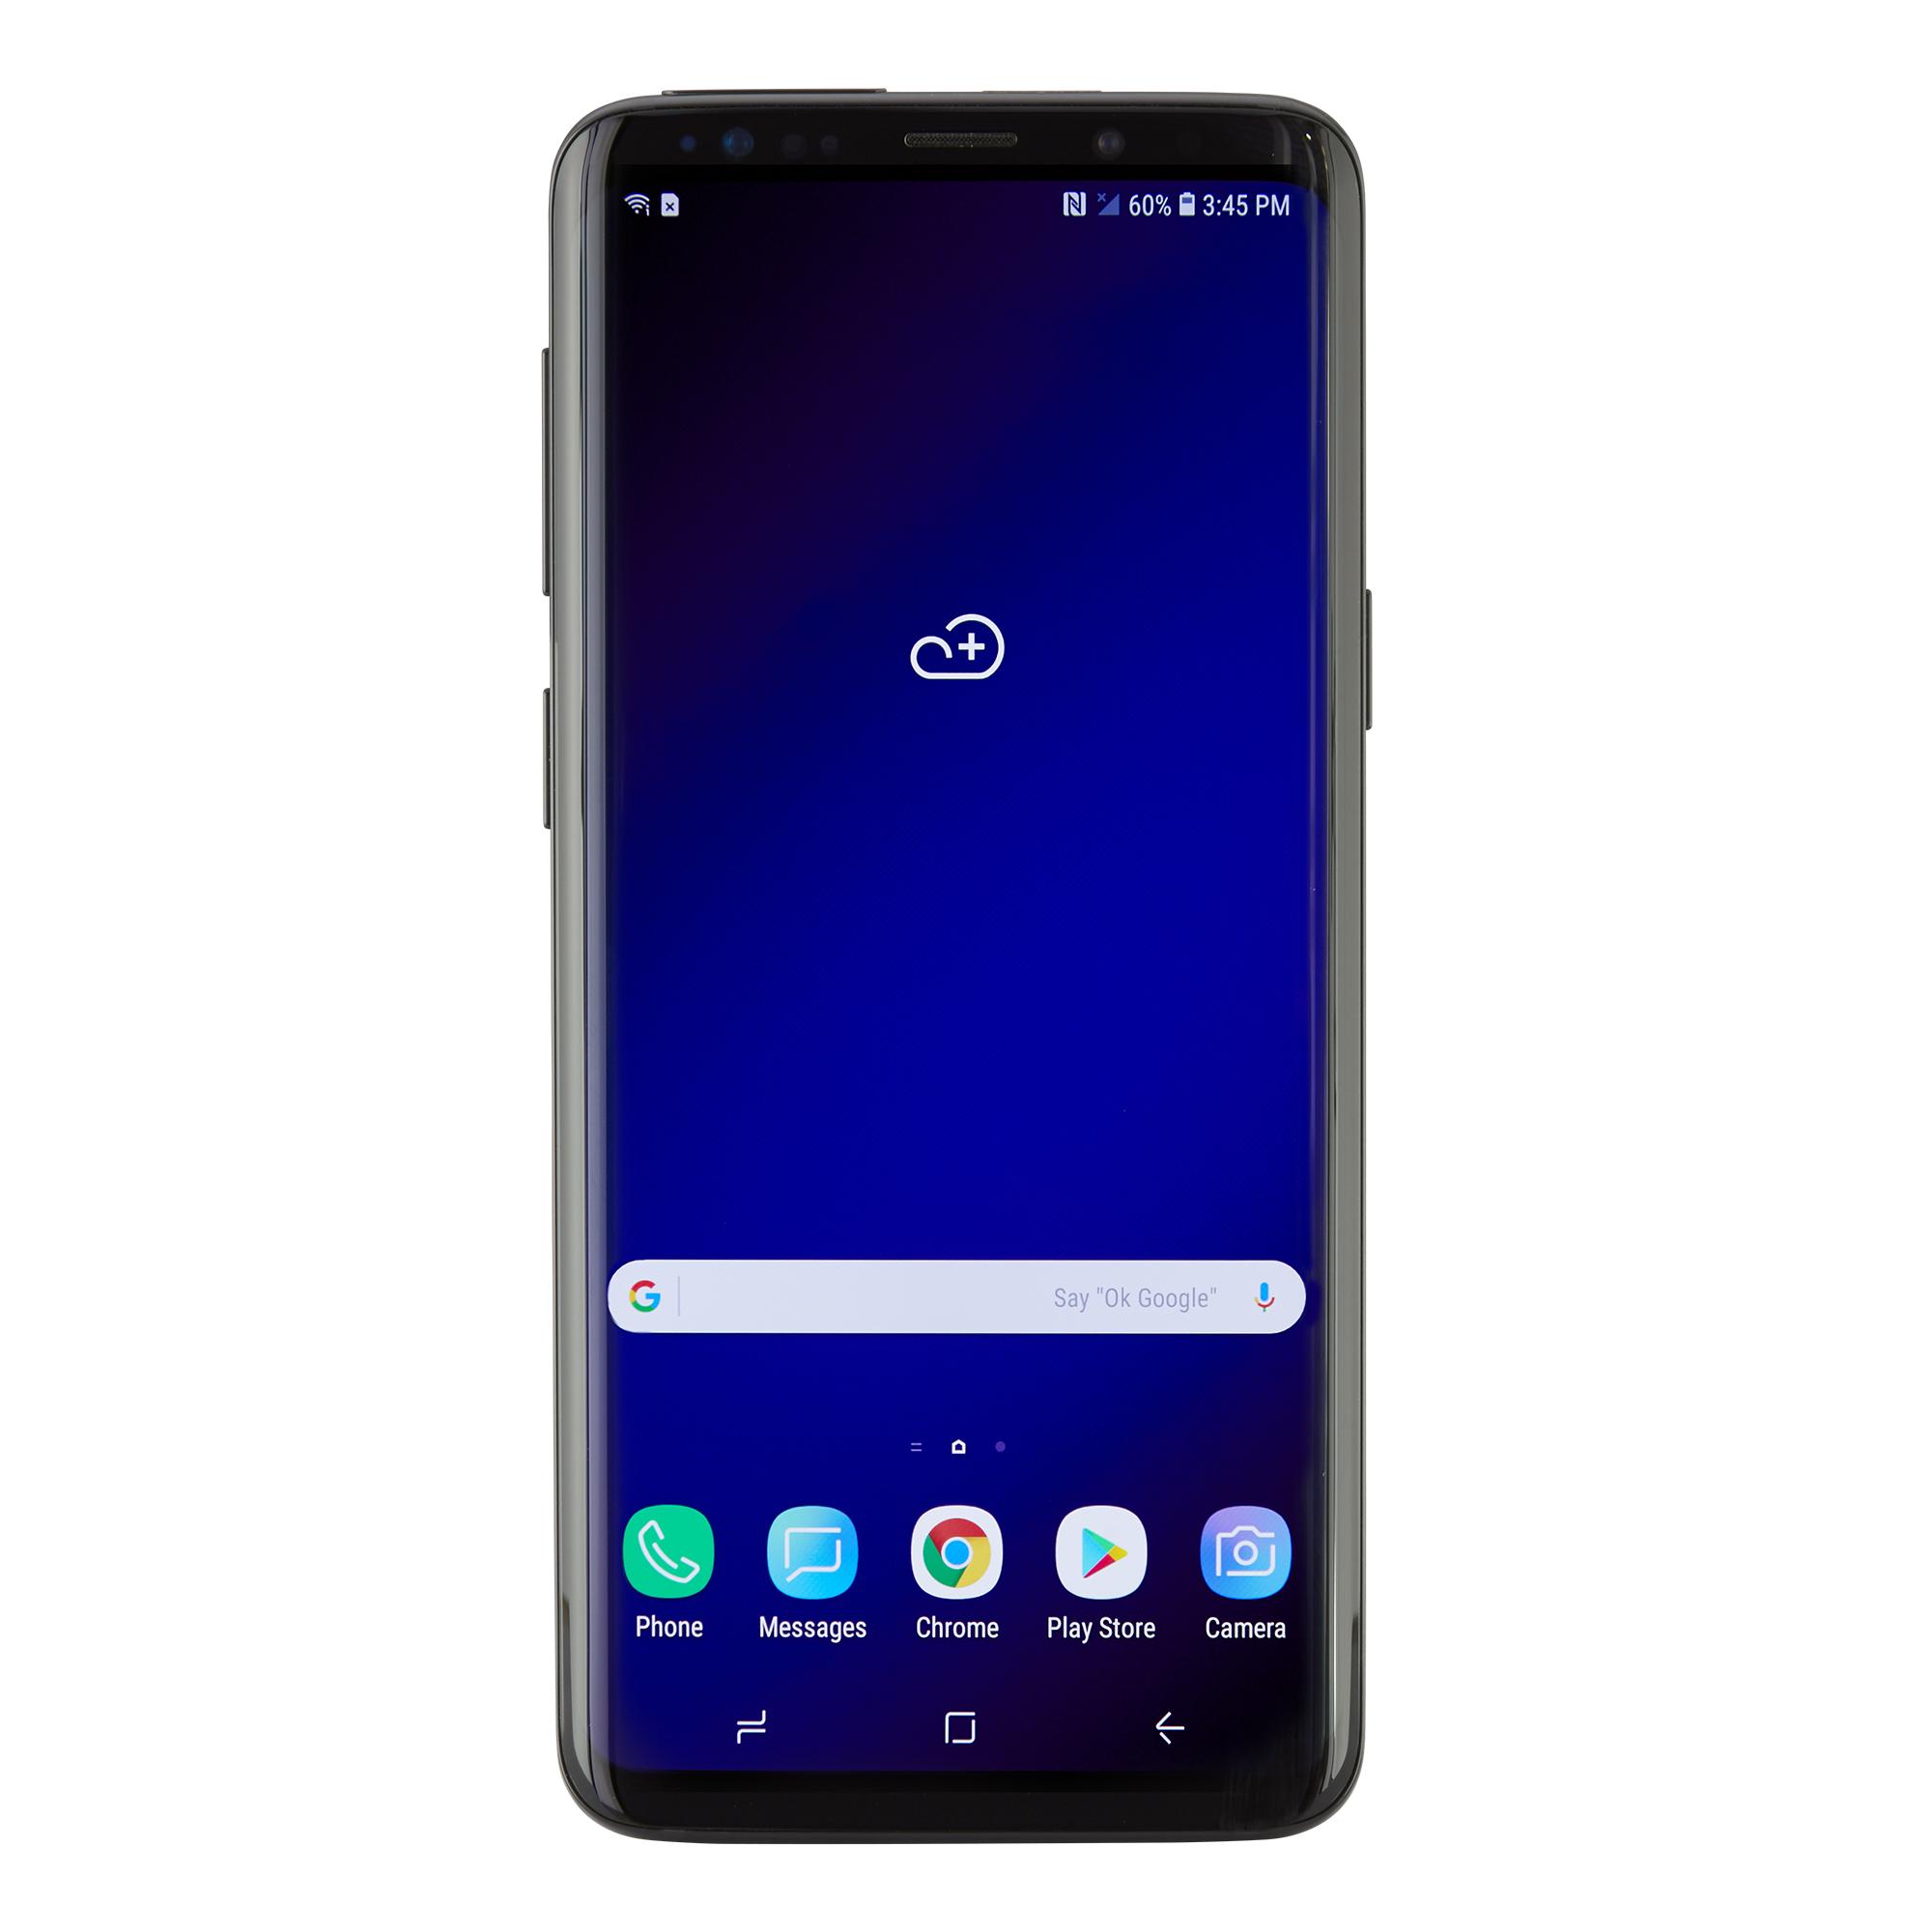 Samsung-Galaxy-S9-SM-G960U-64GB-Smartphone-for-T-Mobile